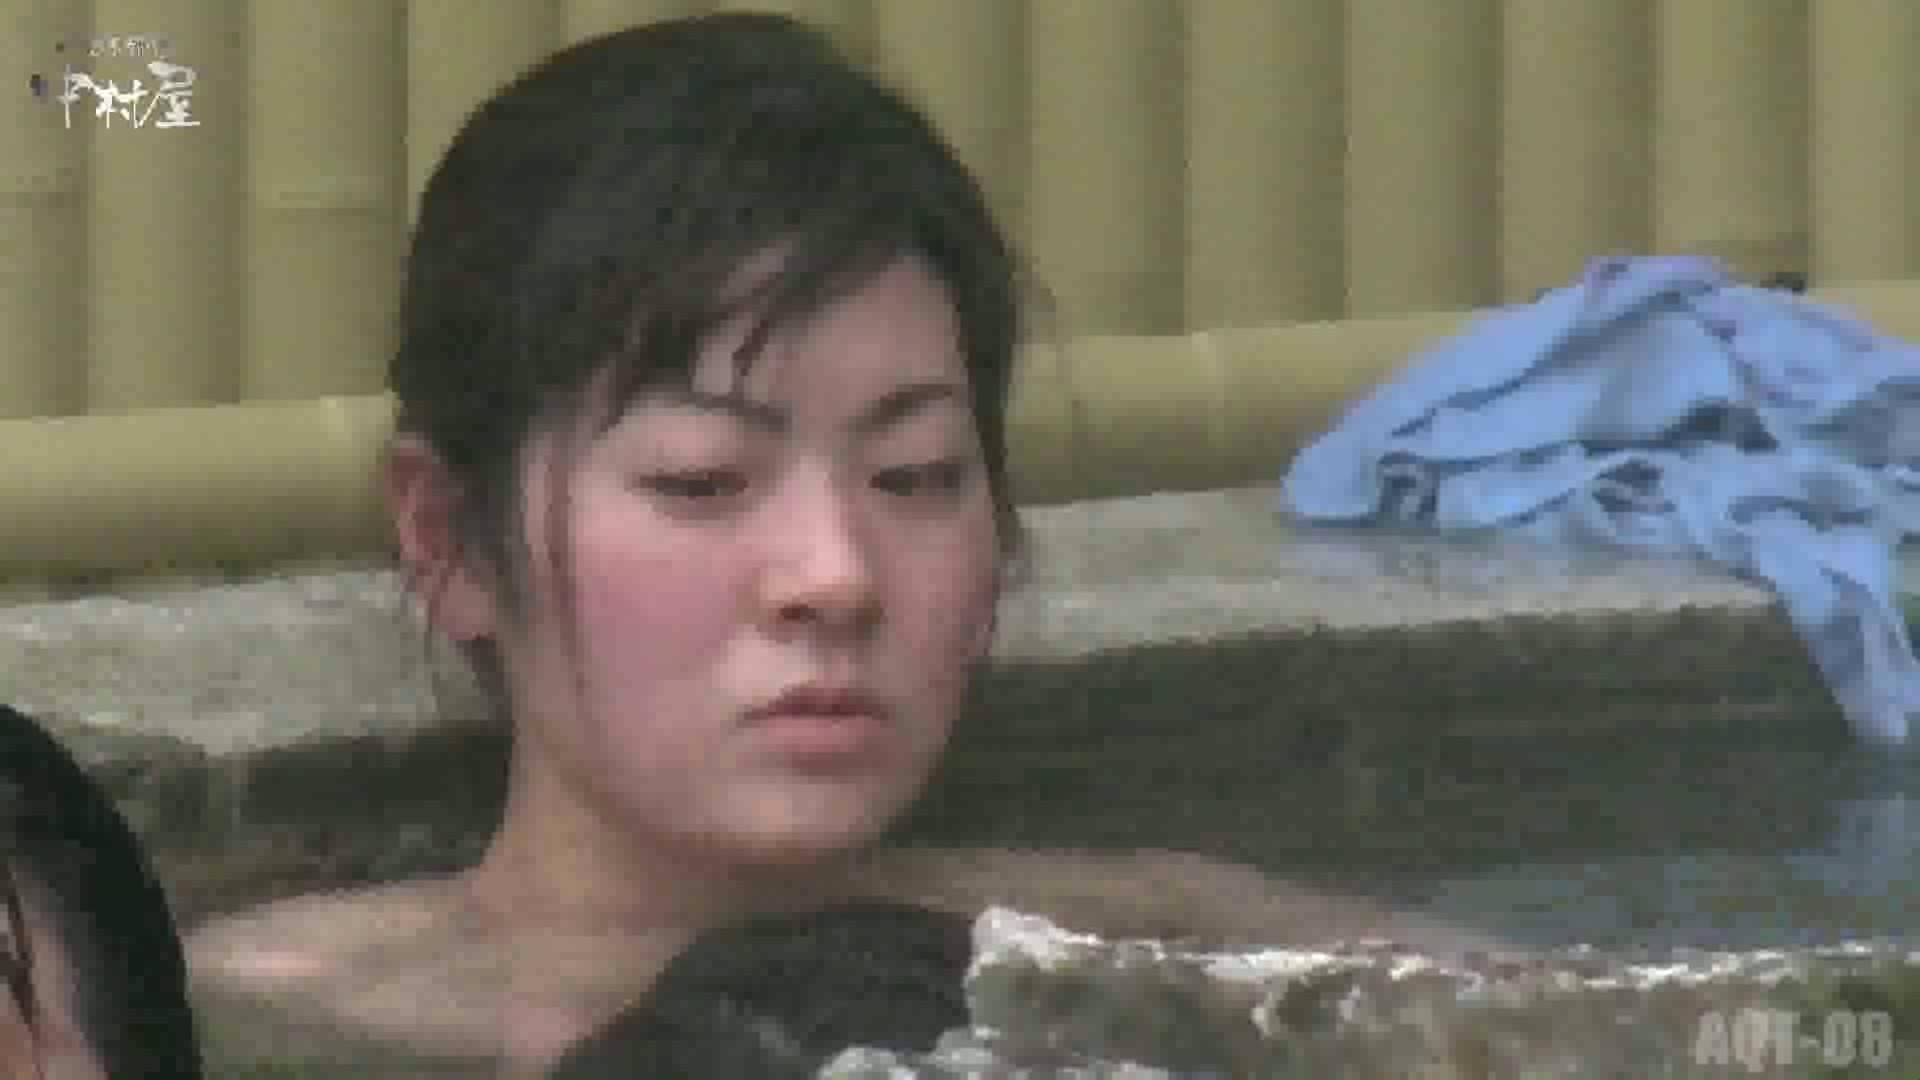 Aquaな露天風呂Vol.872潜入盗撮露天風呂八判湯 其の二 露天風呂 | 潜入  70連発 13